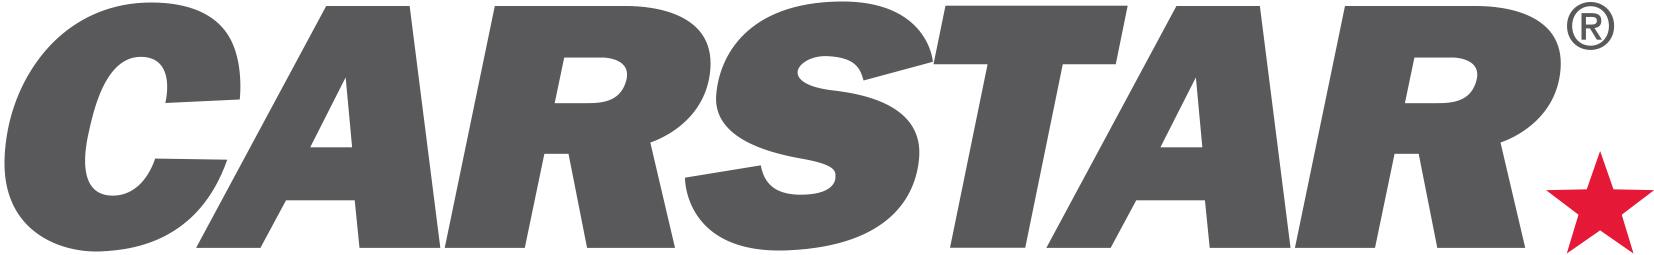 CARSTAR Announces New Advisory Board Members For North America